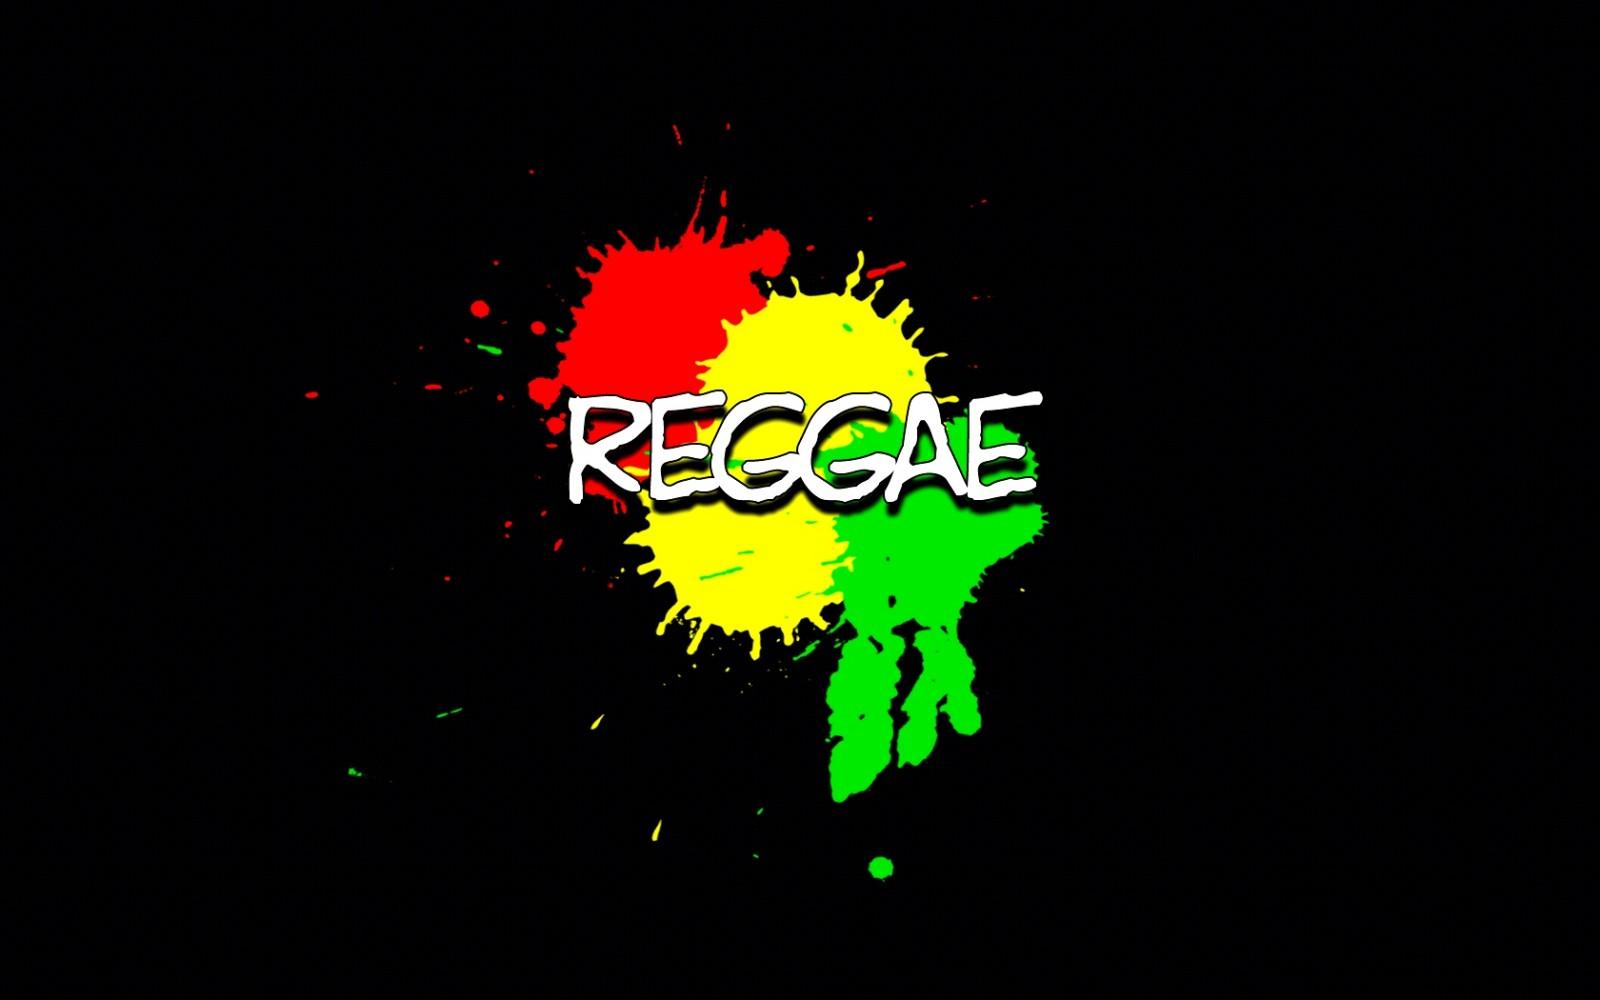 Top 27 Best Rasta Reggae Wallpapers In Hd Graphic Design